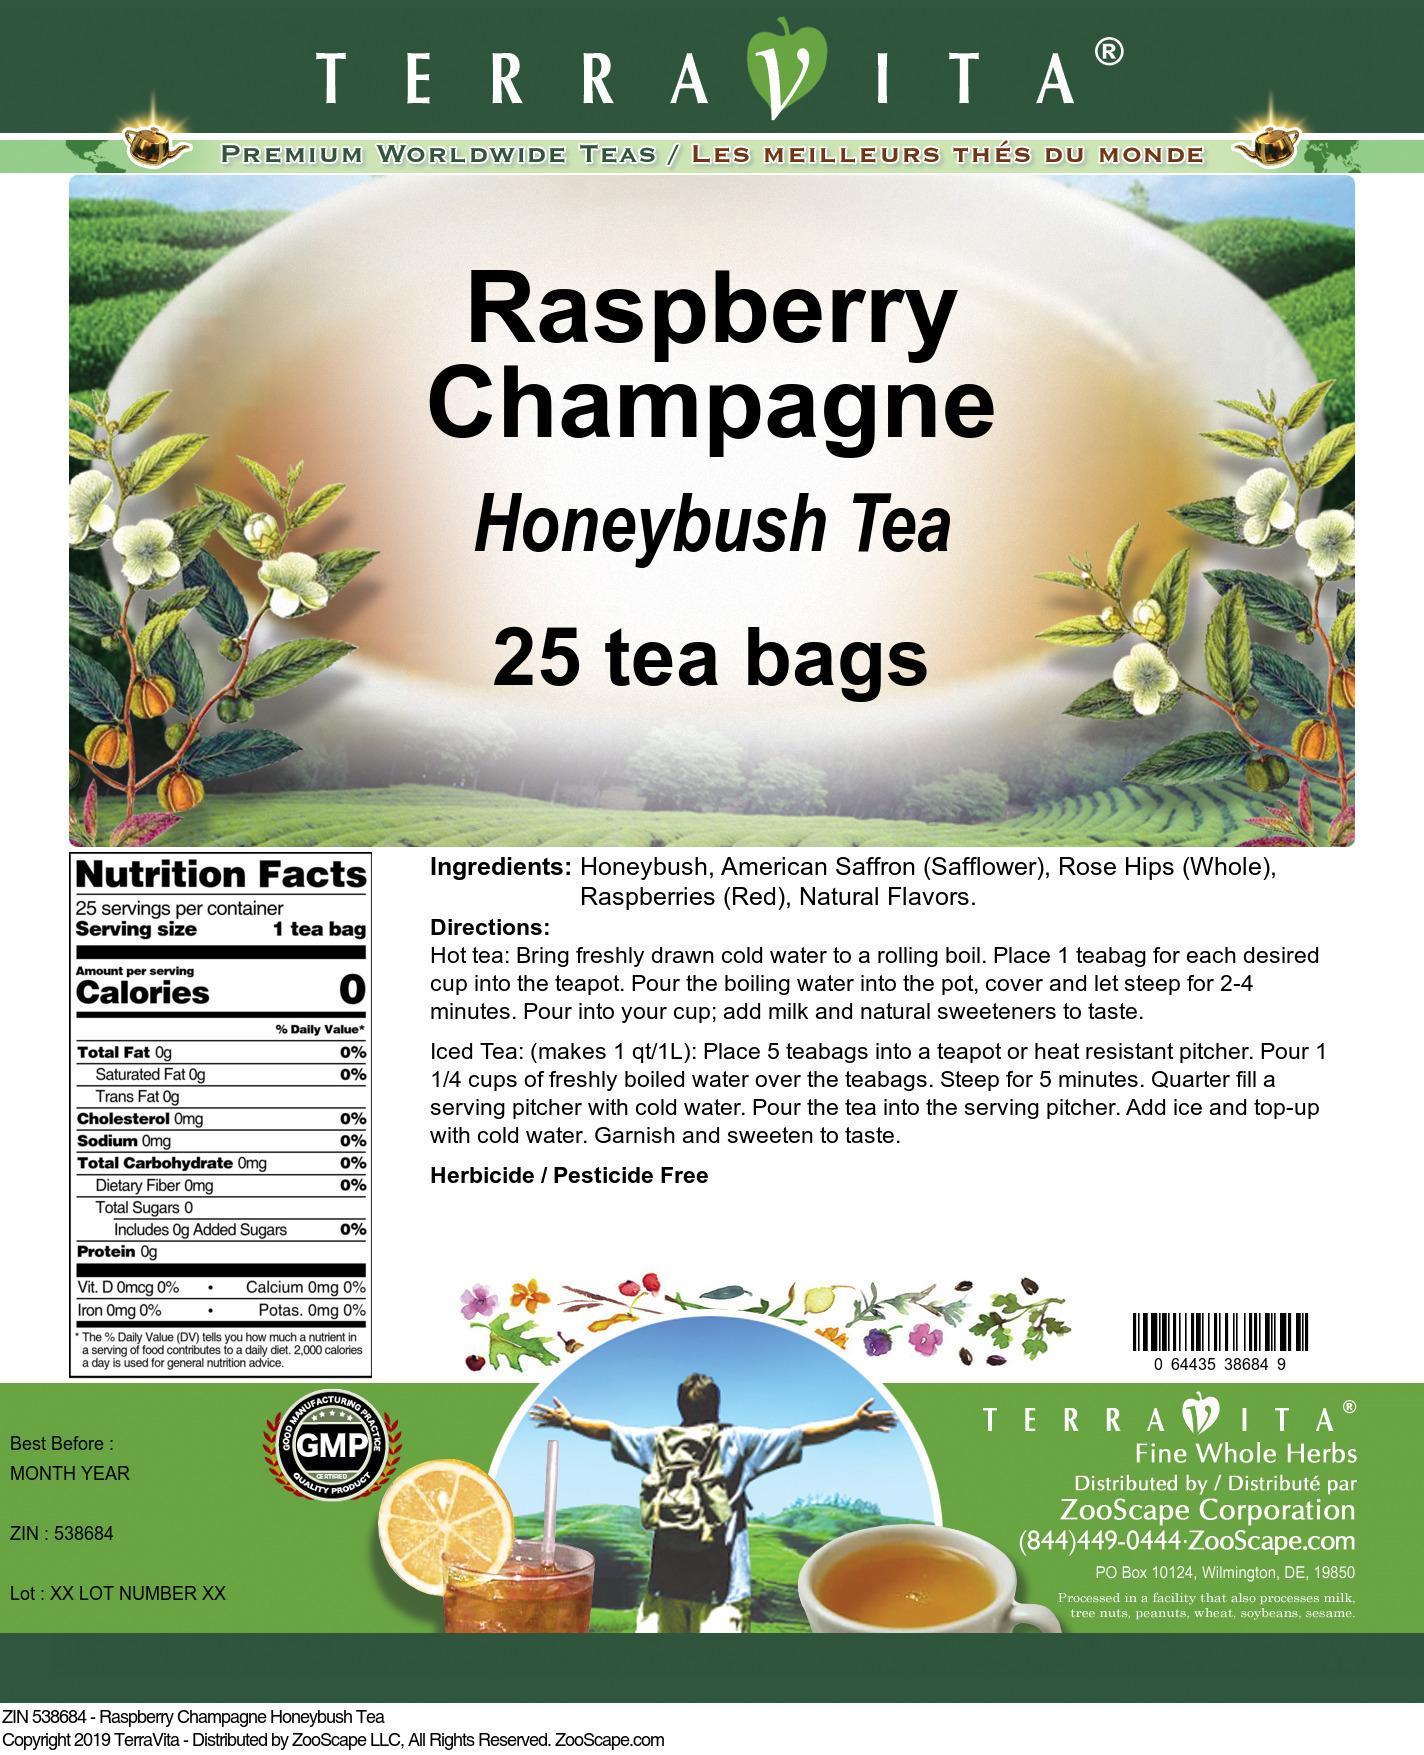 Raspberry Champagne Honeybush Tea